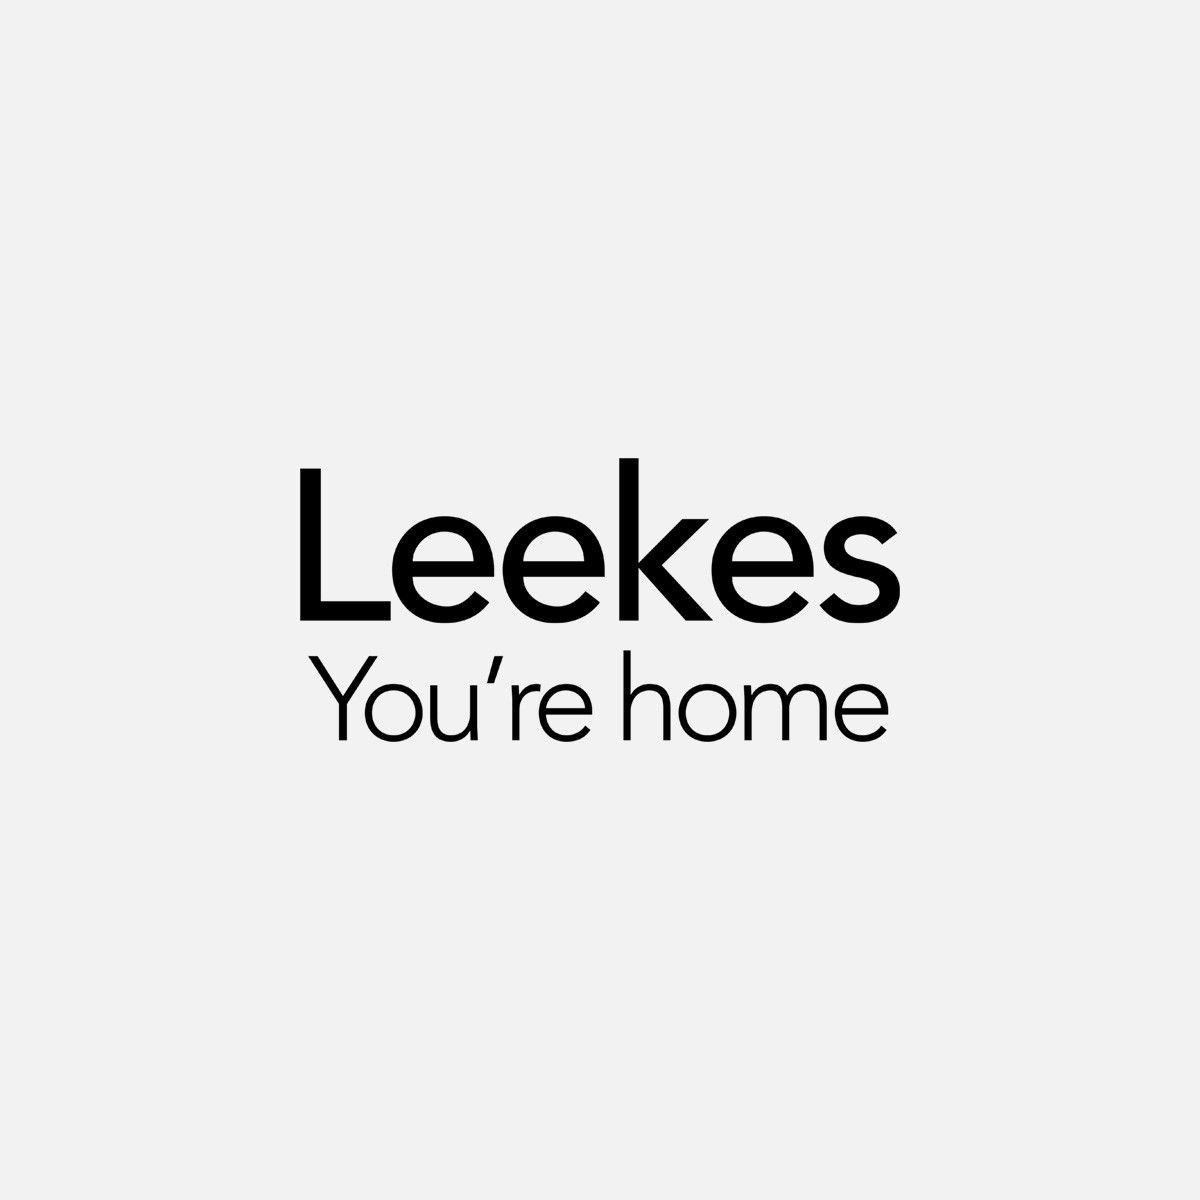 fbfb44e75e Ted Baker Lobster Blue Beach Towel Ted Baker Lobster Blue Beach Towel